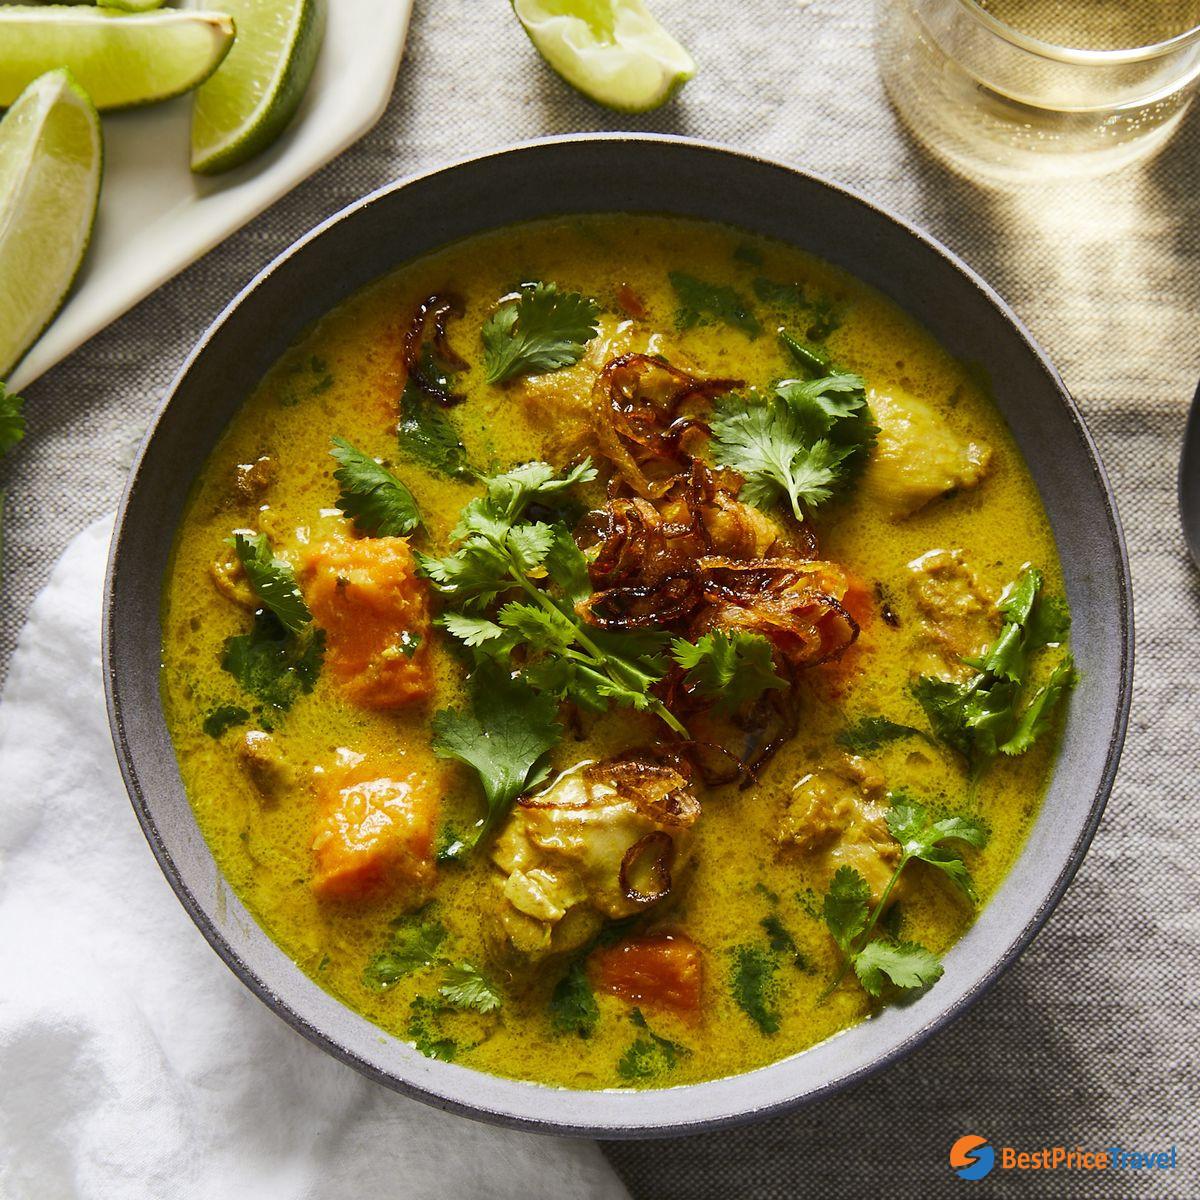 Burmese Style Chicken Curry - top must-try food in Myanmar